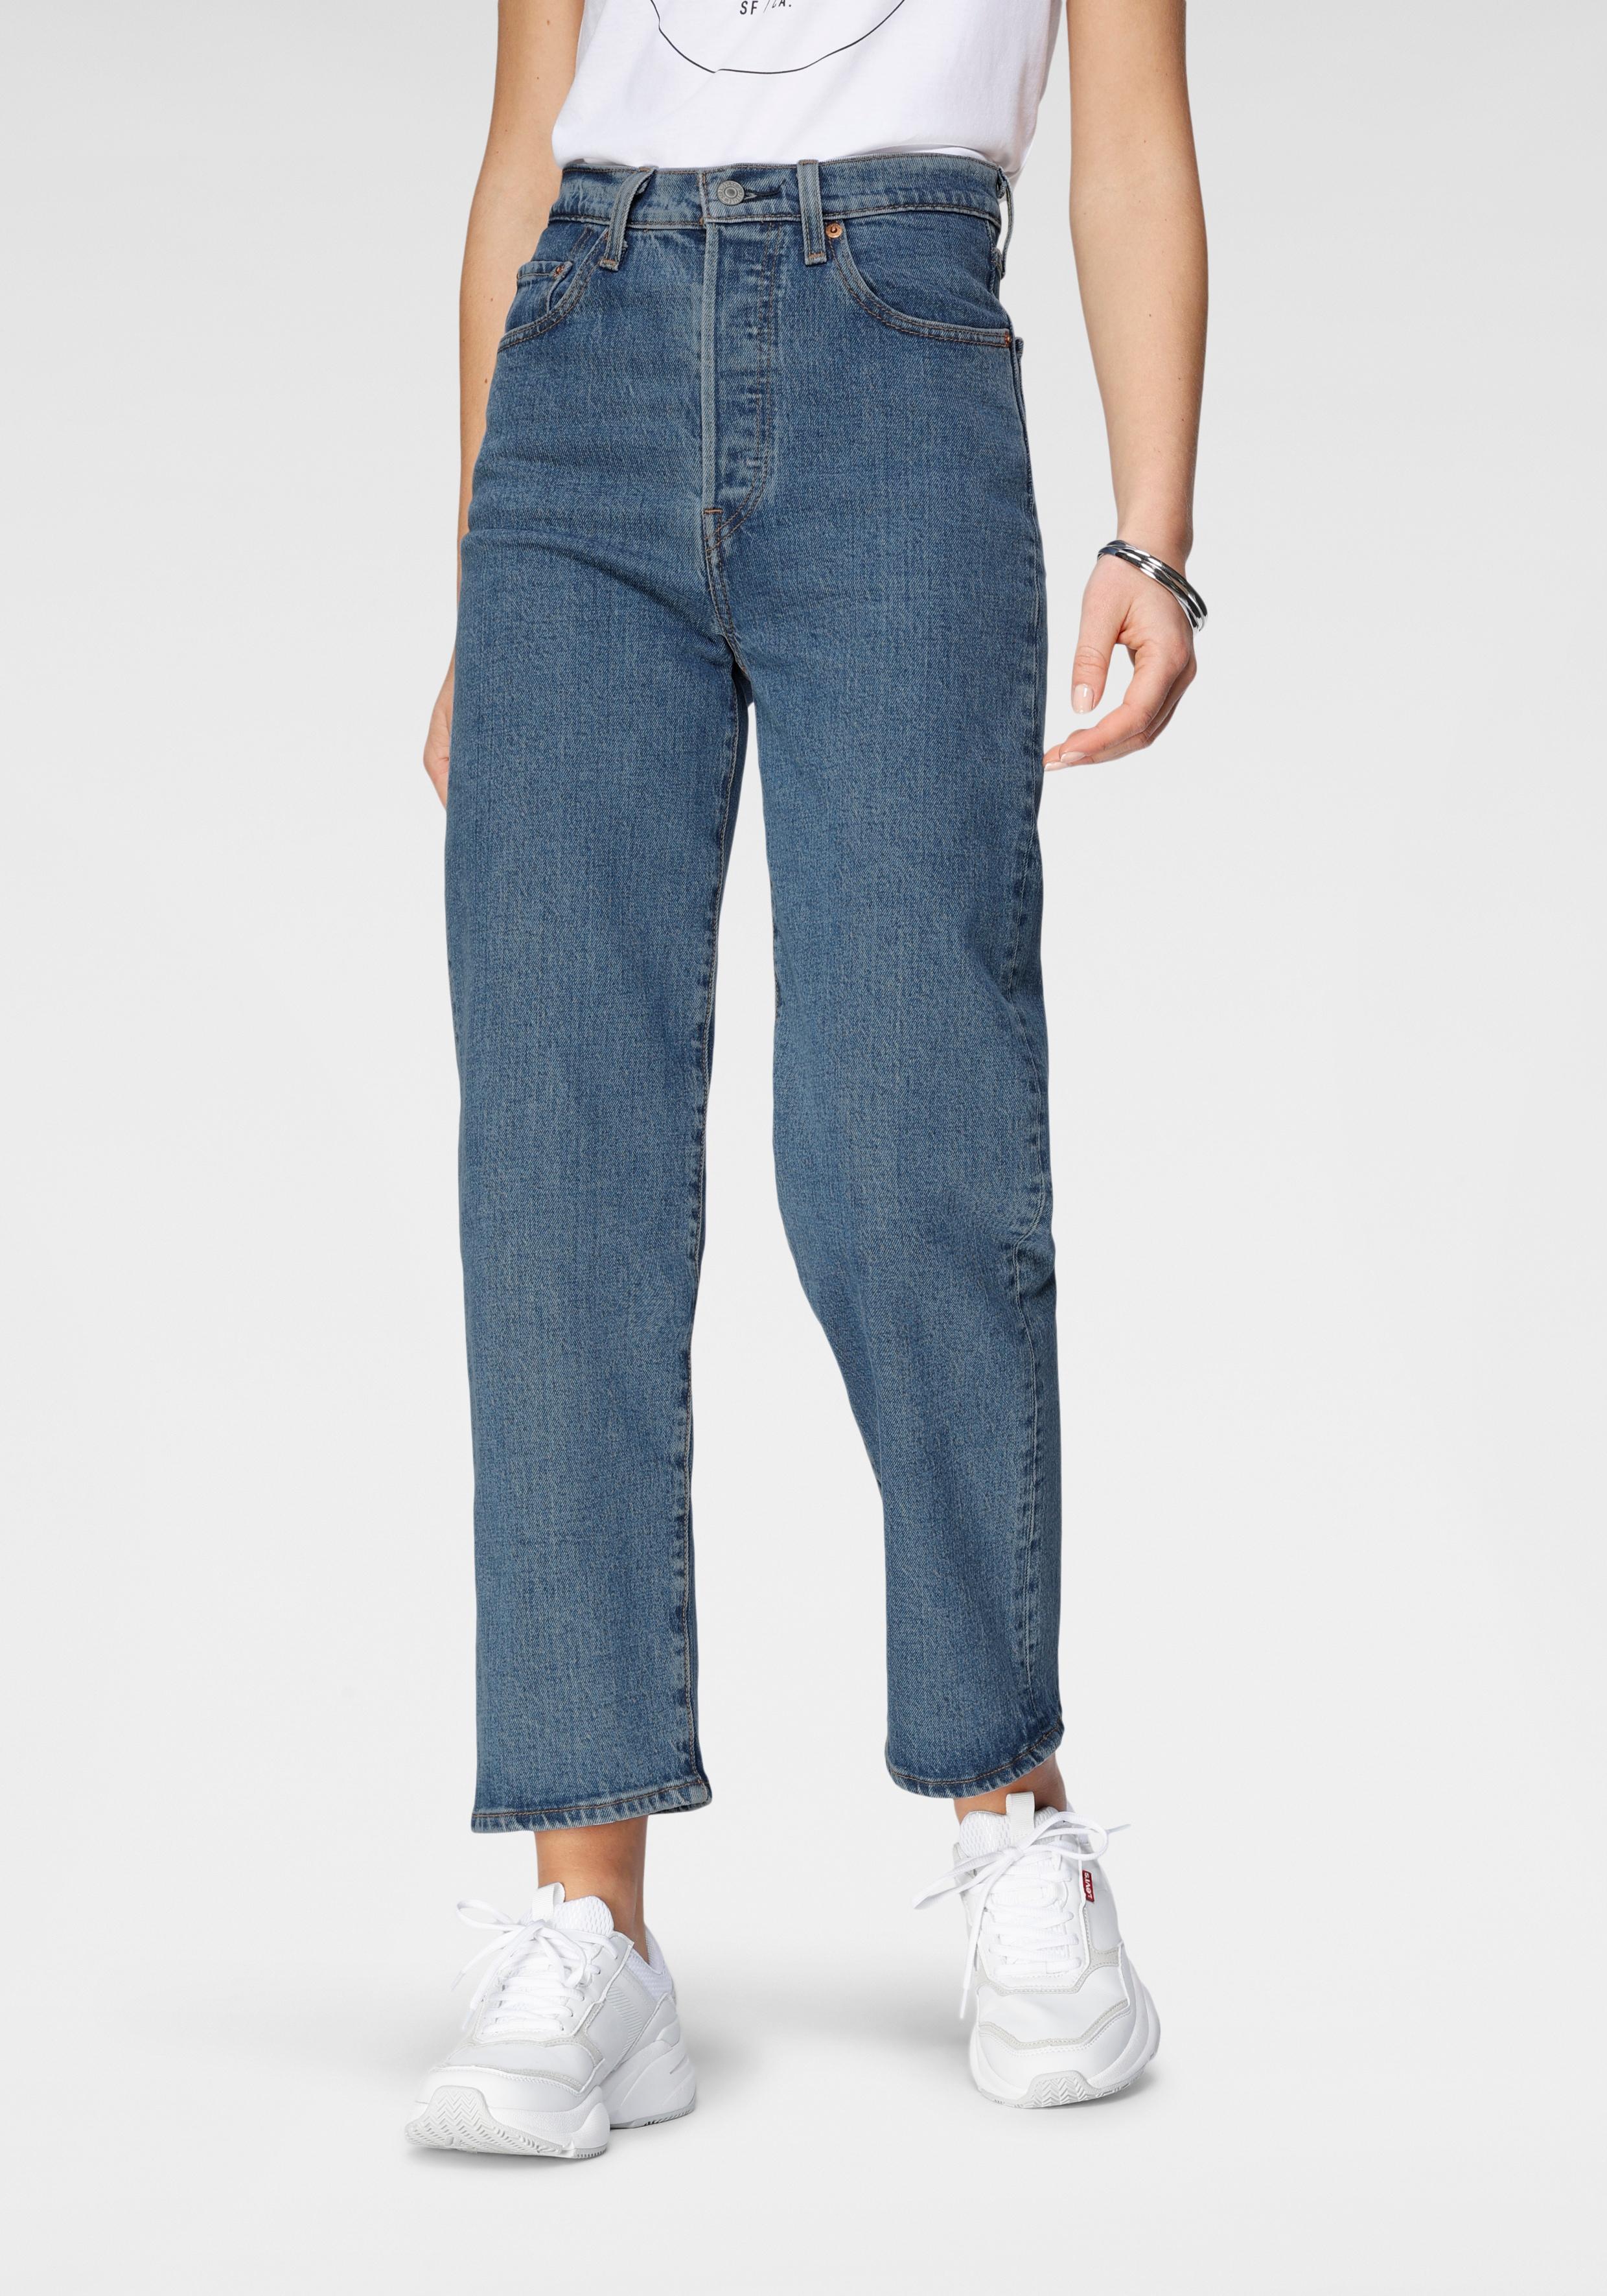 levis - Levi's 5-Pocket-Jeans by GNTM, mit Knopfleiste